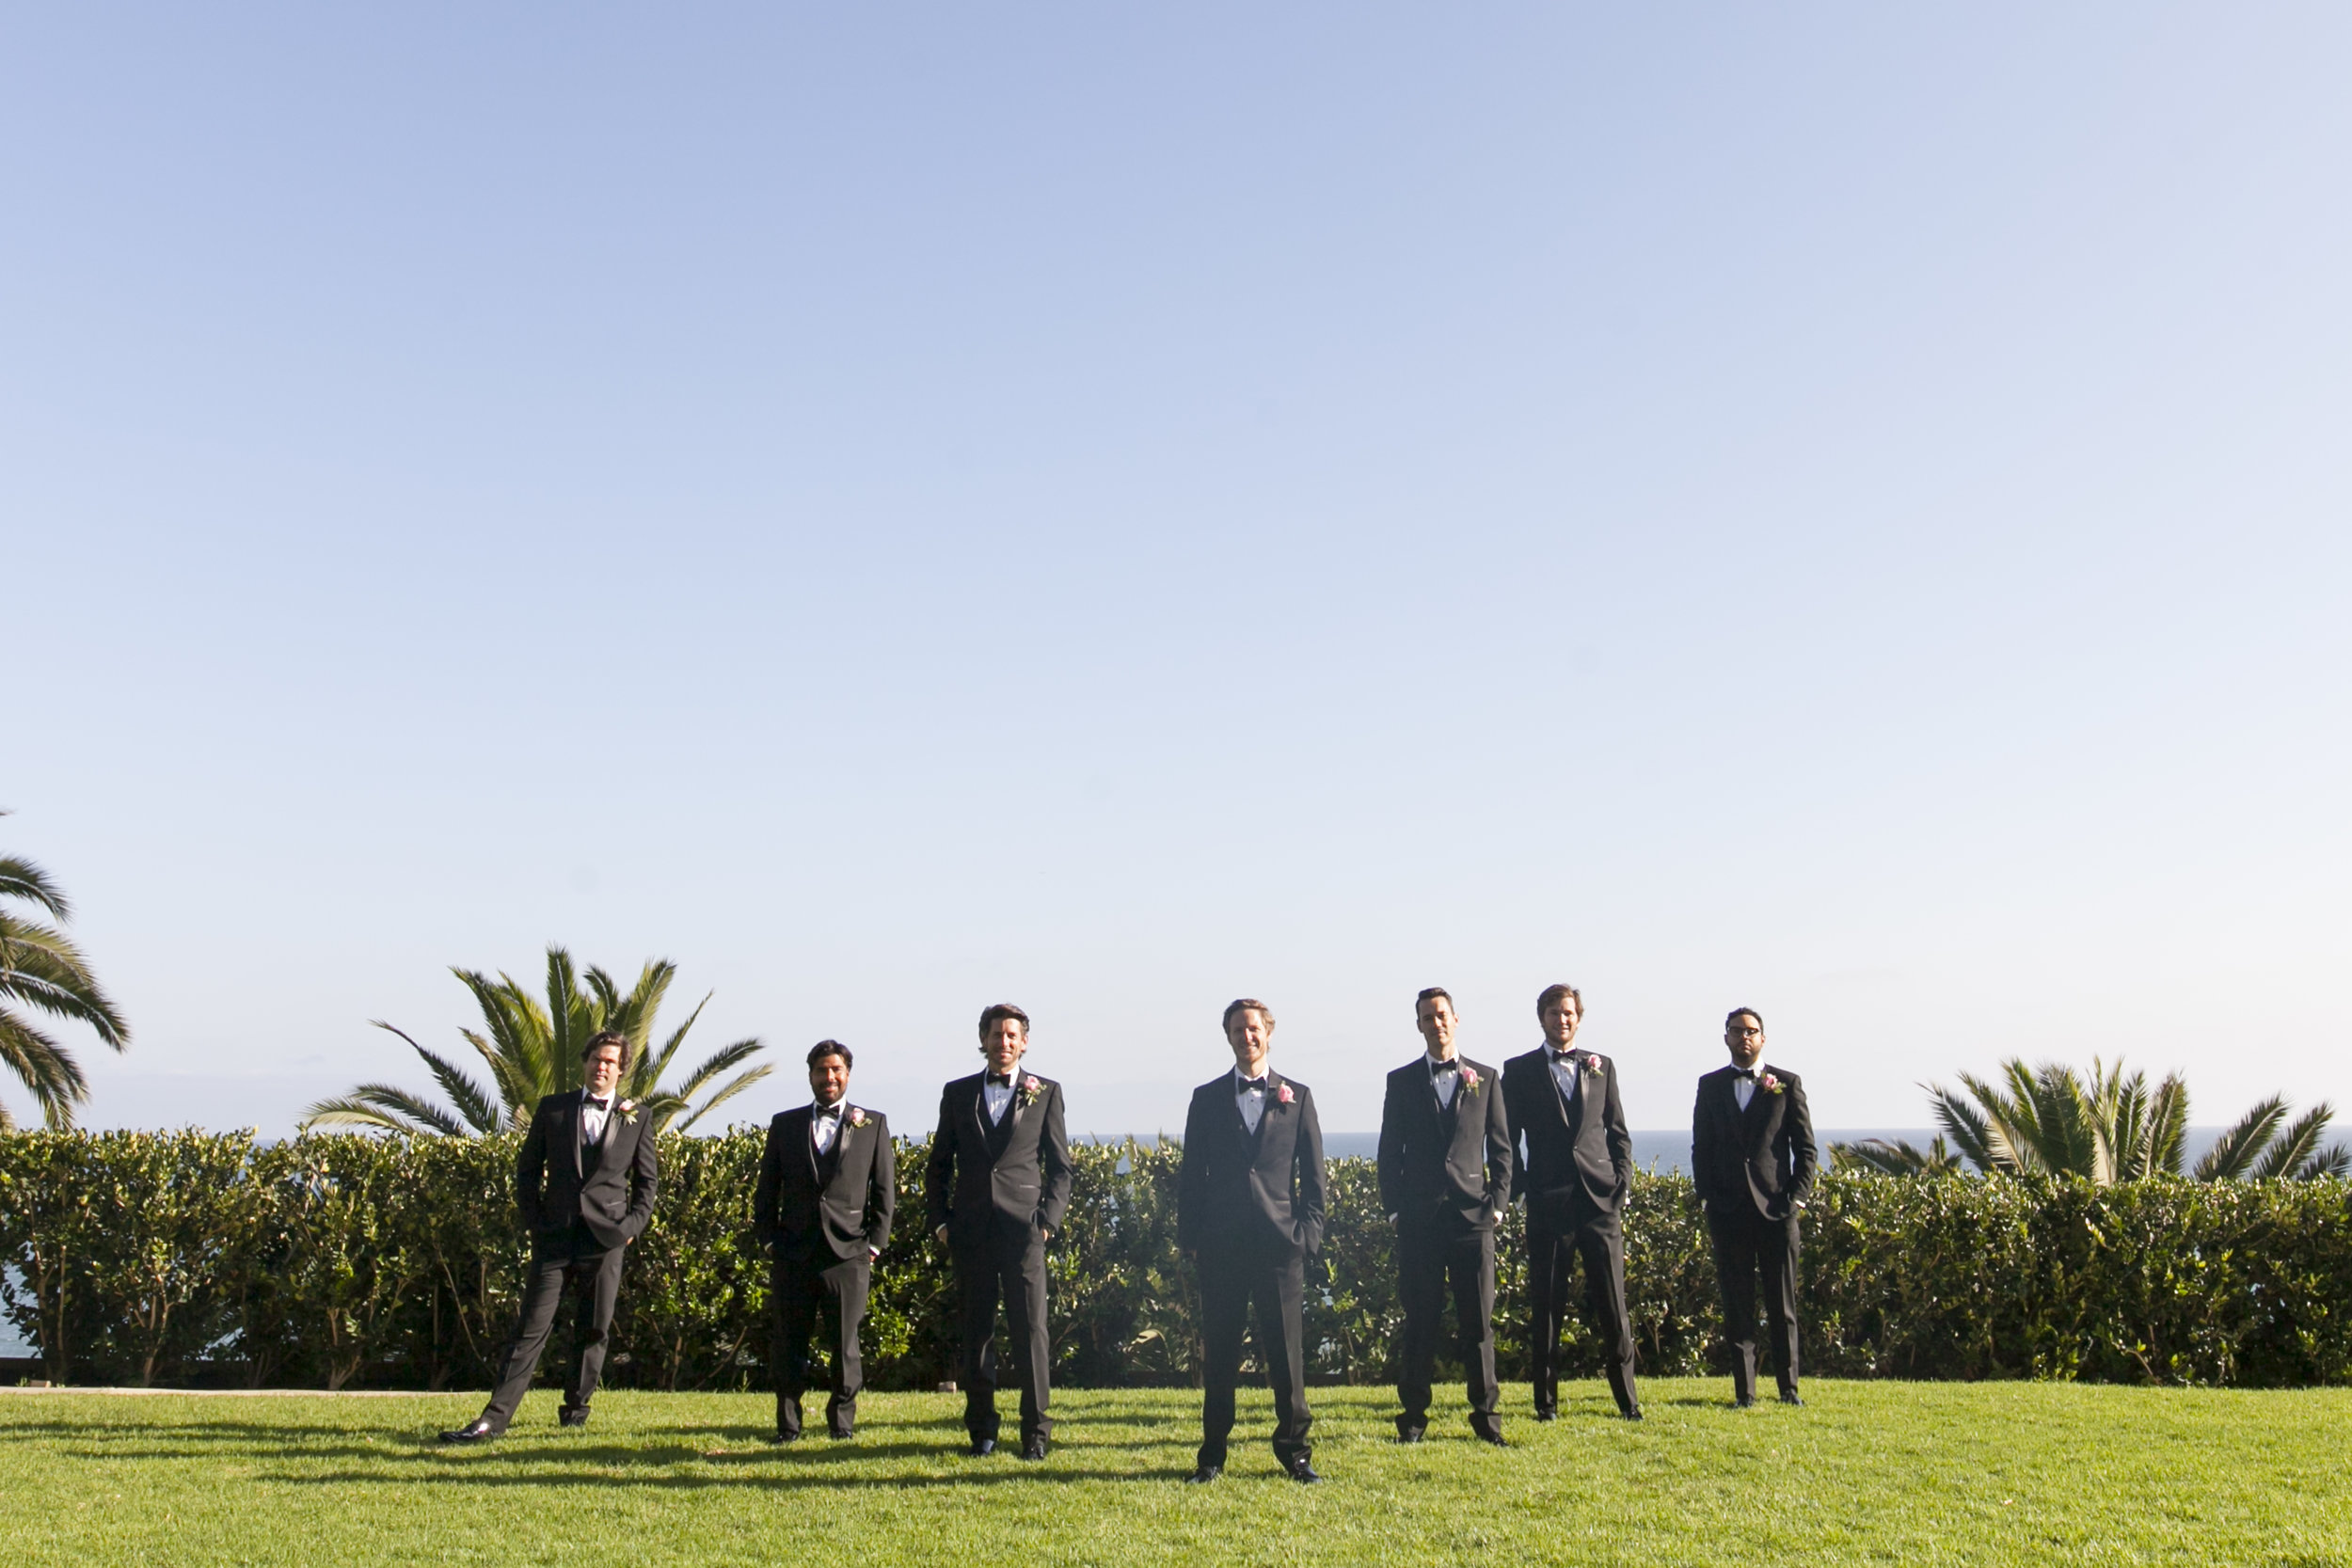 Groomsman Photos - A Romantic Bel Air Bay Club Ocean-View Wedding - Southern California Wedding - Kevin Dinh Photography